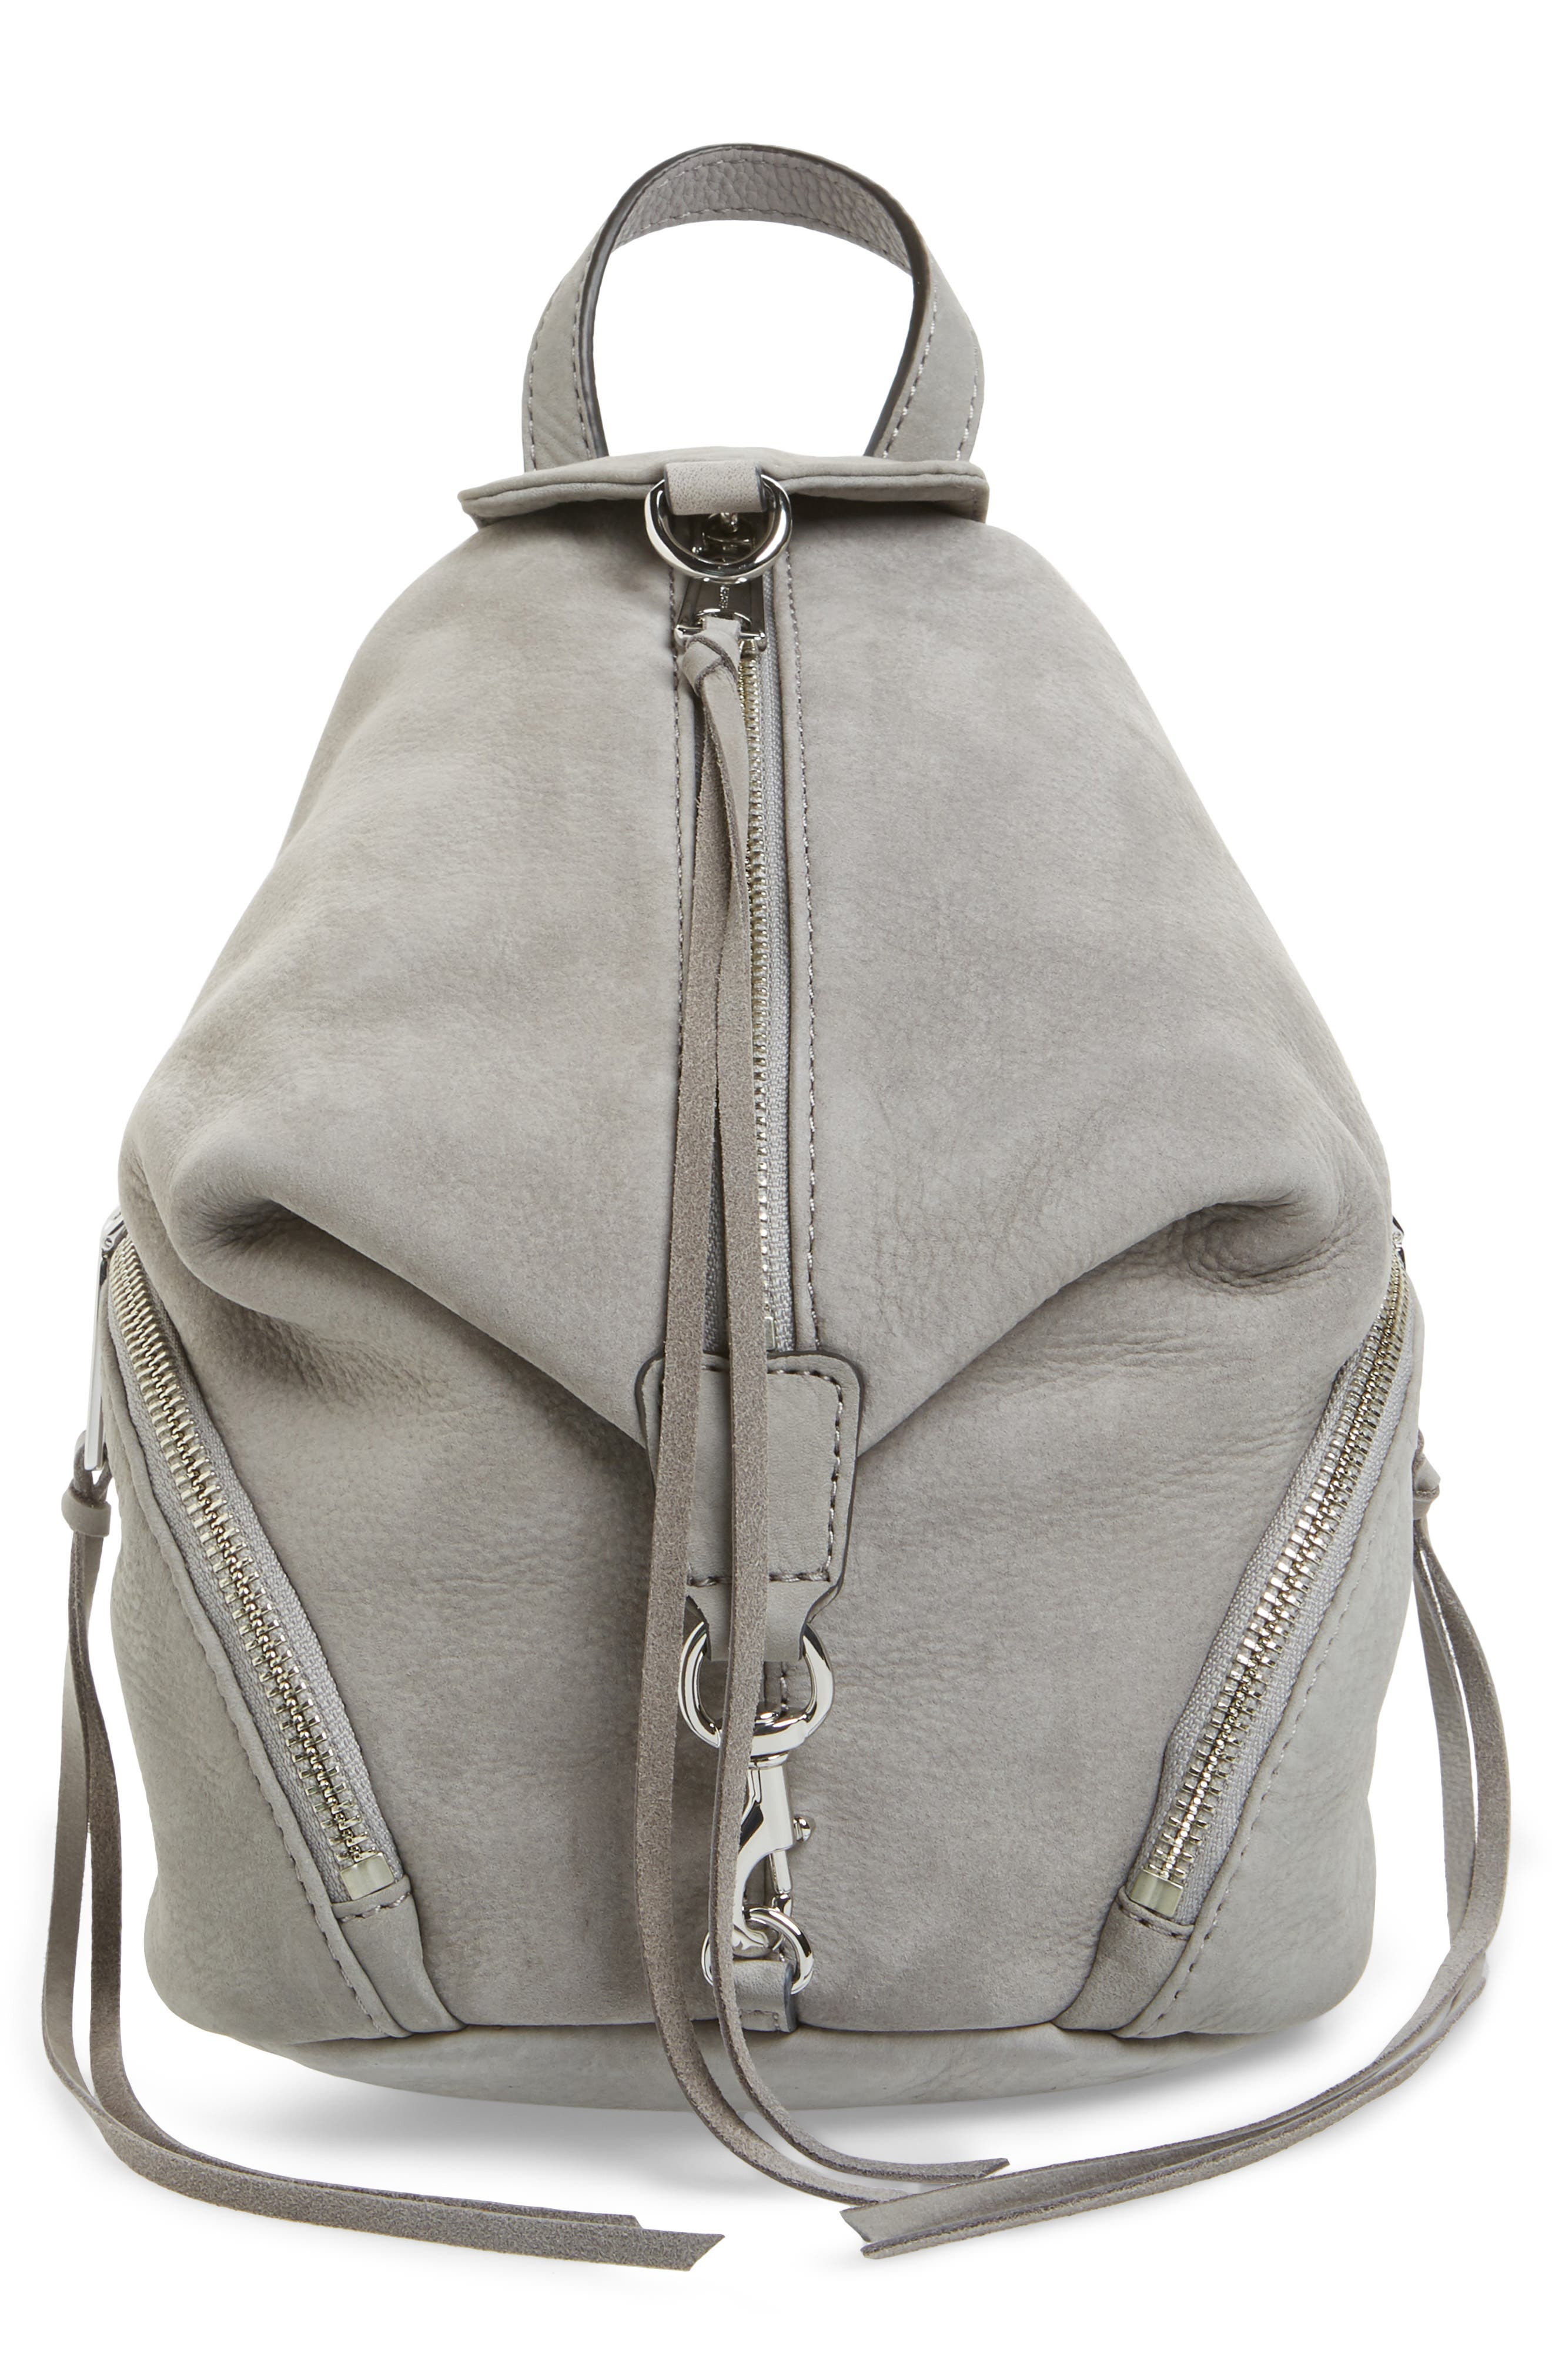 Mini Julian Nubuck Leather Convertible Backpack,                             Main thumbnail 1, color,                             GREY